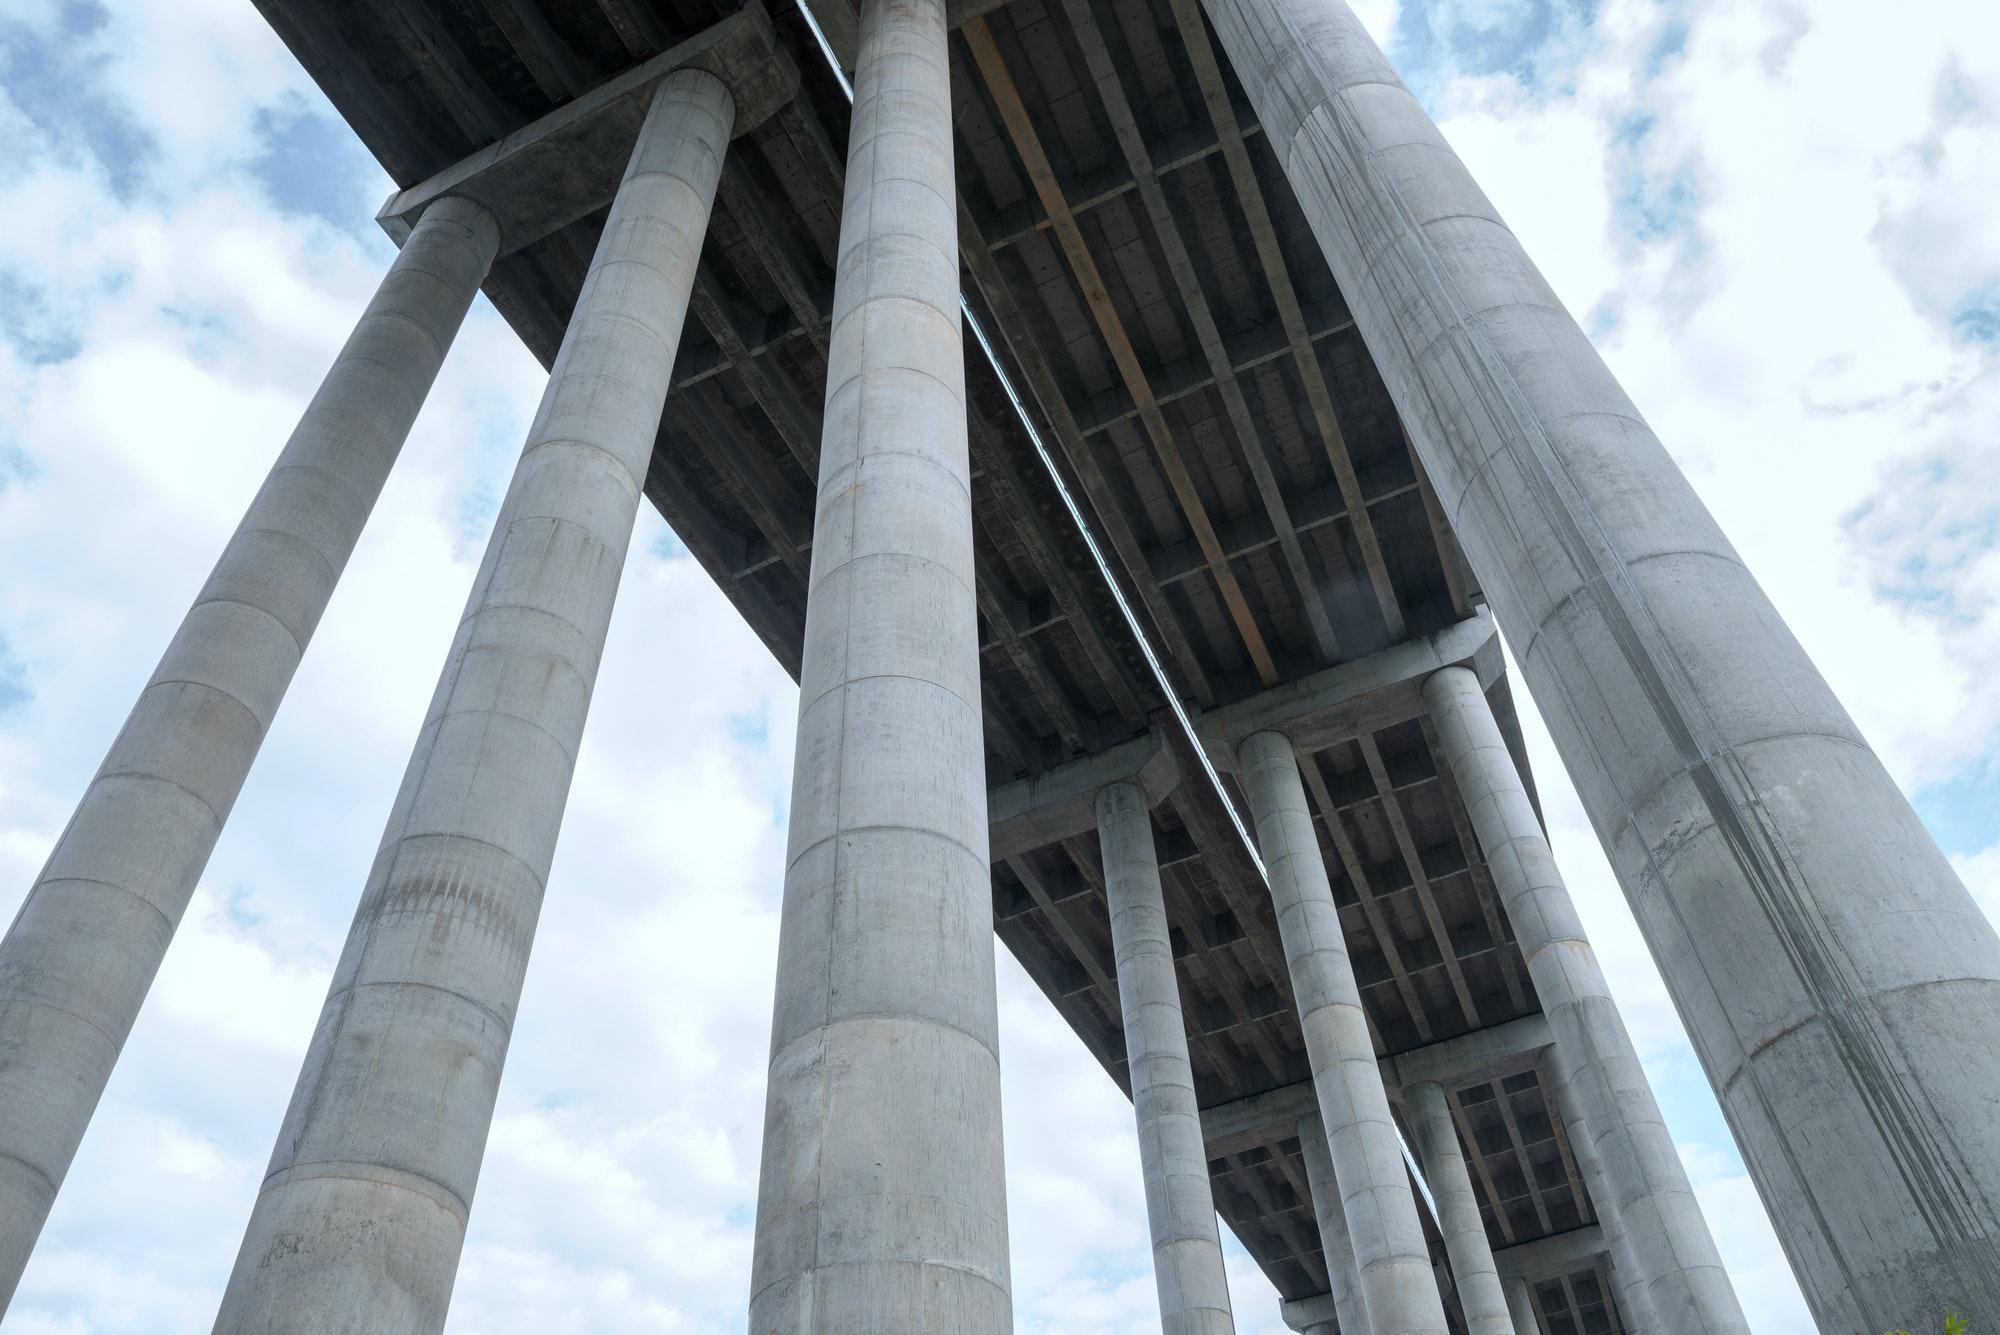 Bridge pier